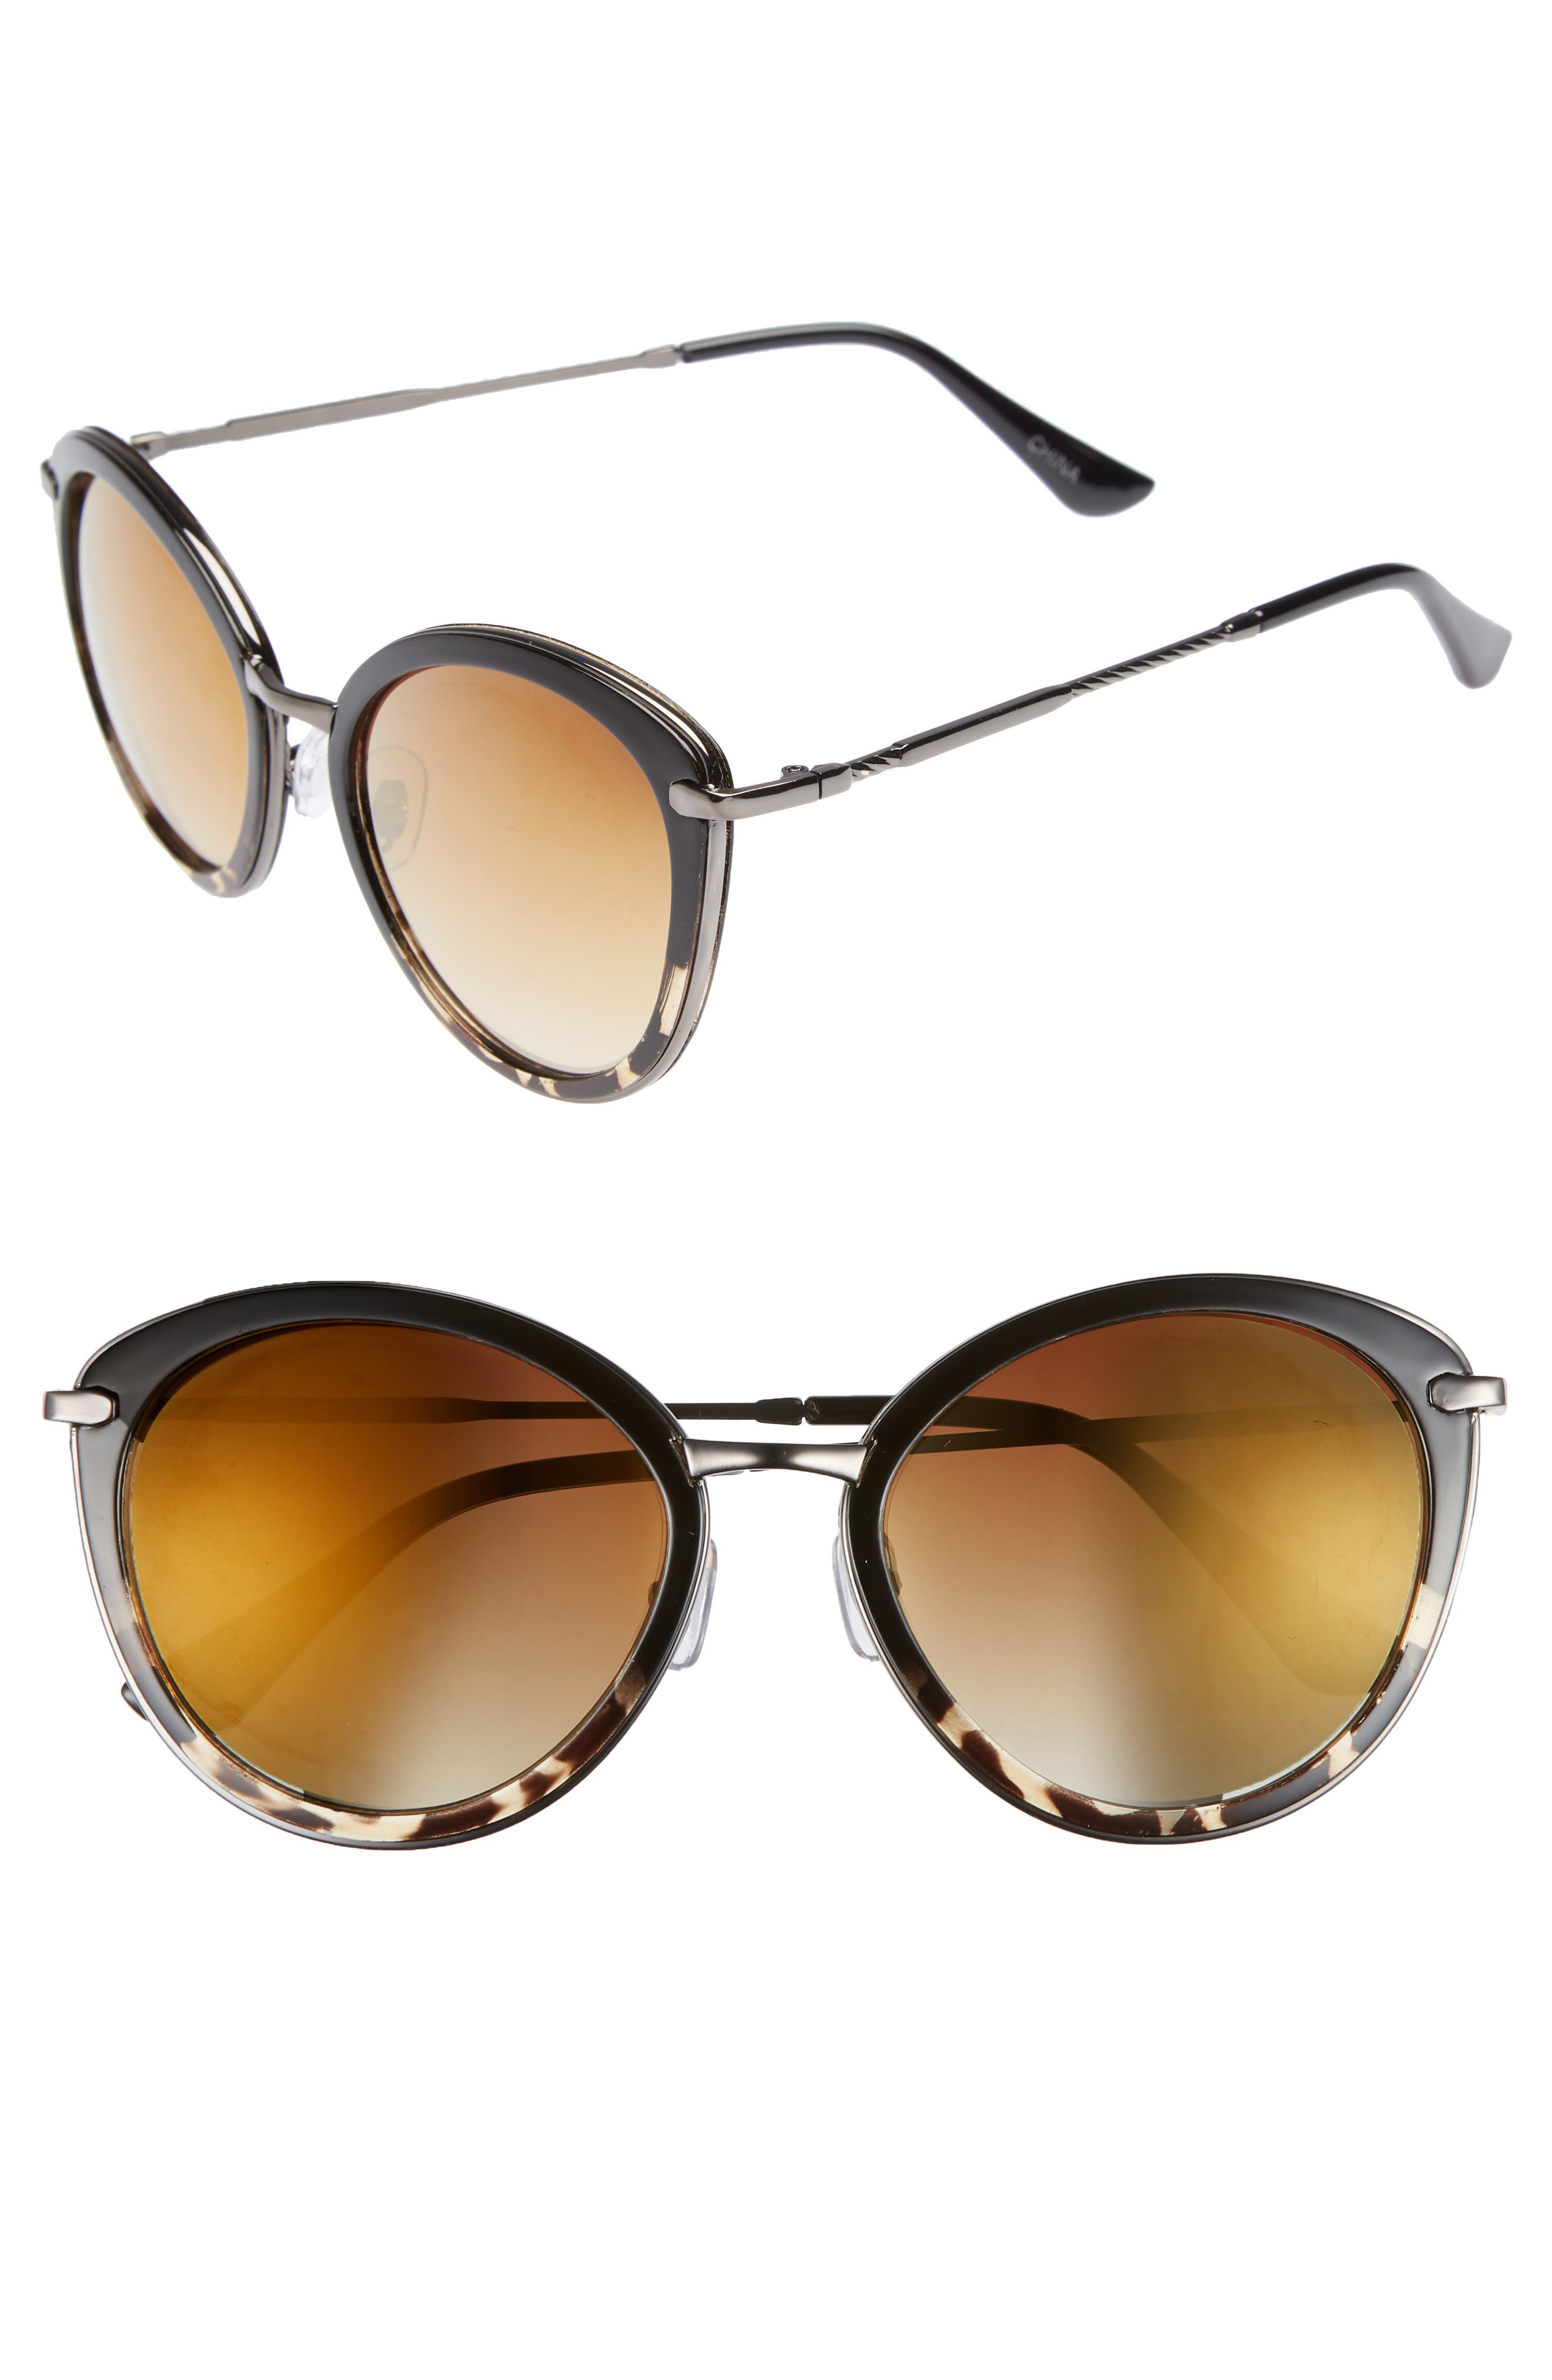 54mm Round Sunglasses,                         Main,                         color, Black/ Tort